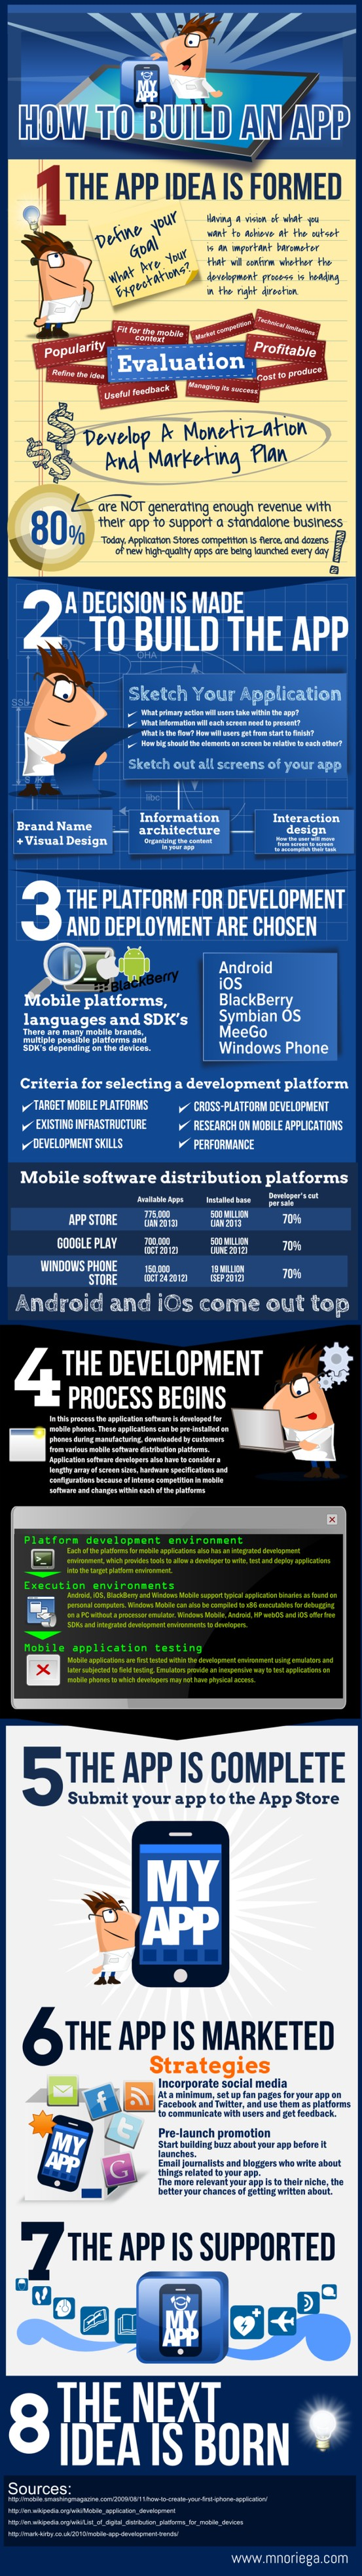 How To Build An App Infografia Infographic Software Programmieren Lernen Programmieren Lernen